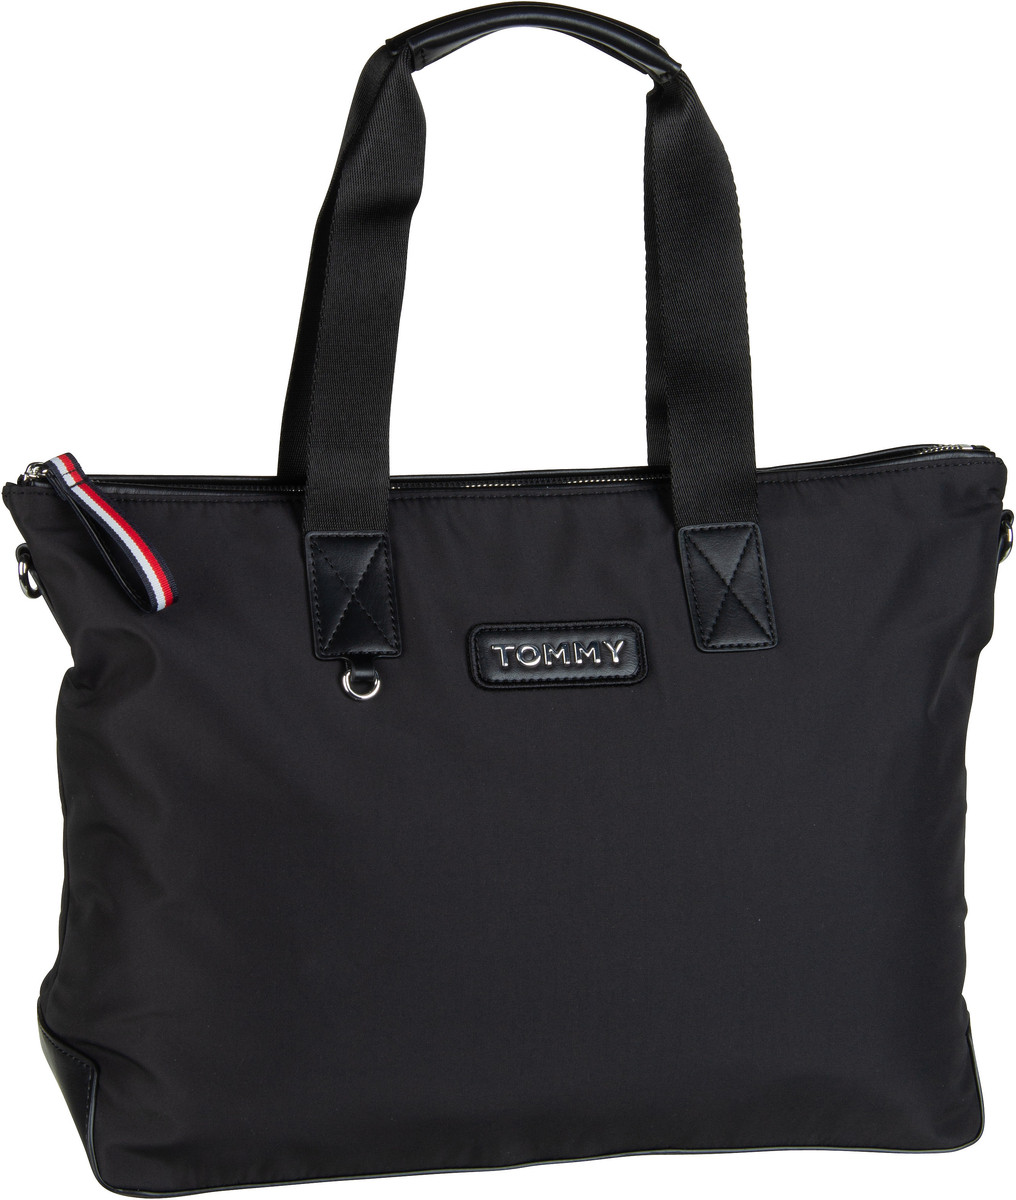 Handtasche Varsity Nylon Tote 6114 Black